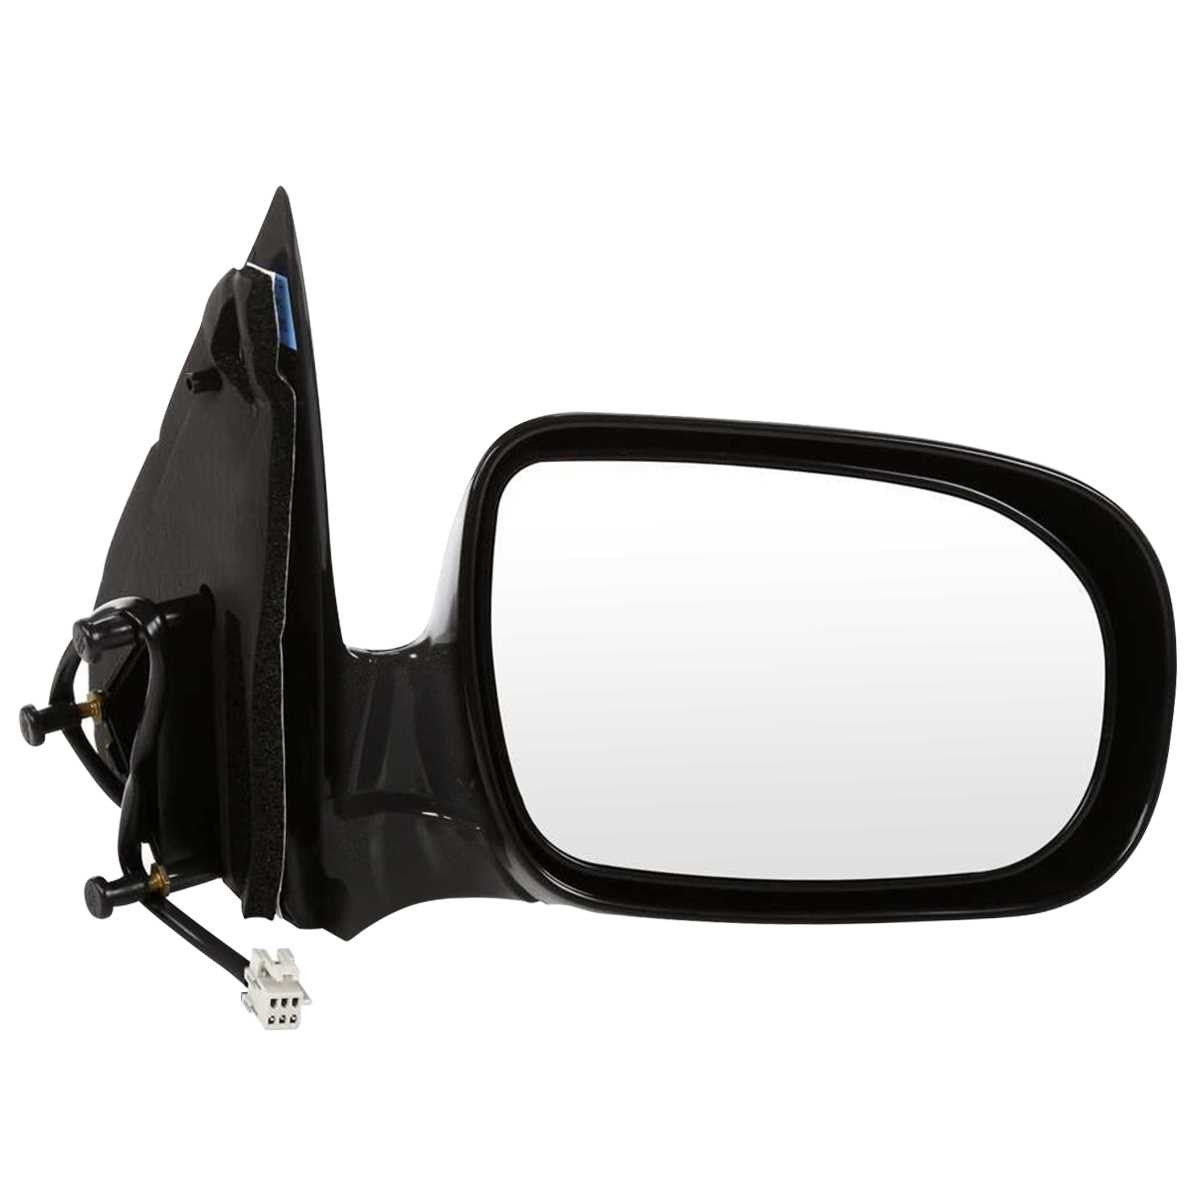 Auto Shack KAPCH1321271S Manual Folding Smooth Side View Mirror Passengers Side